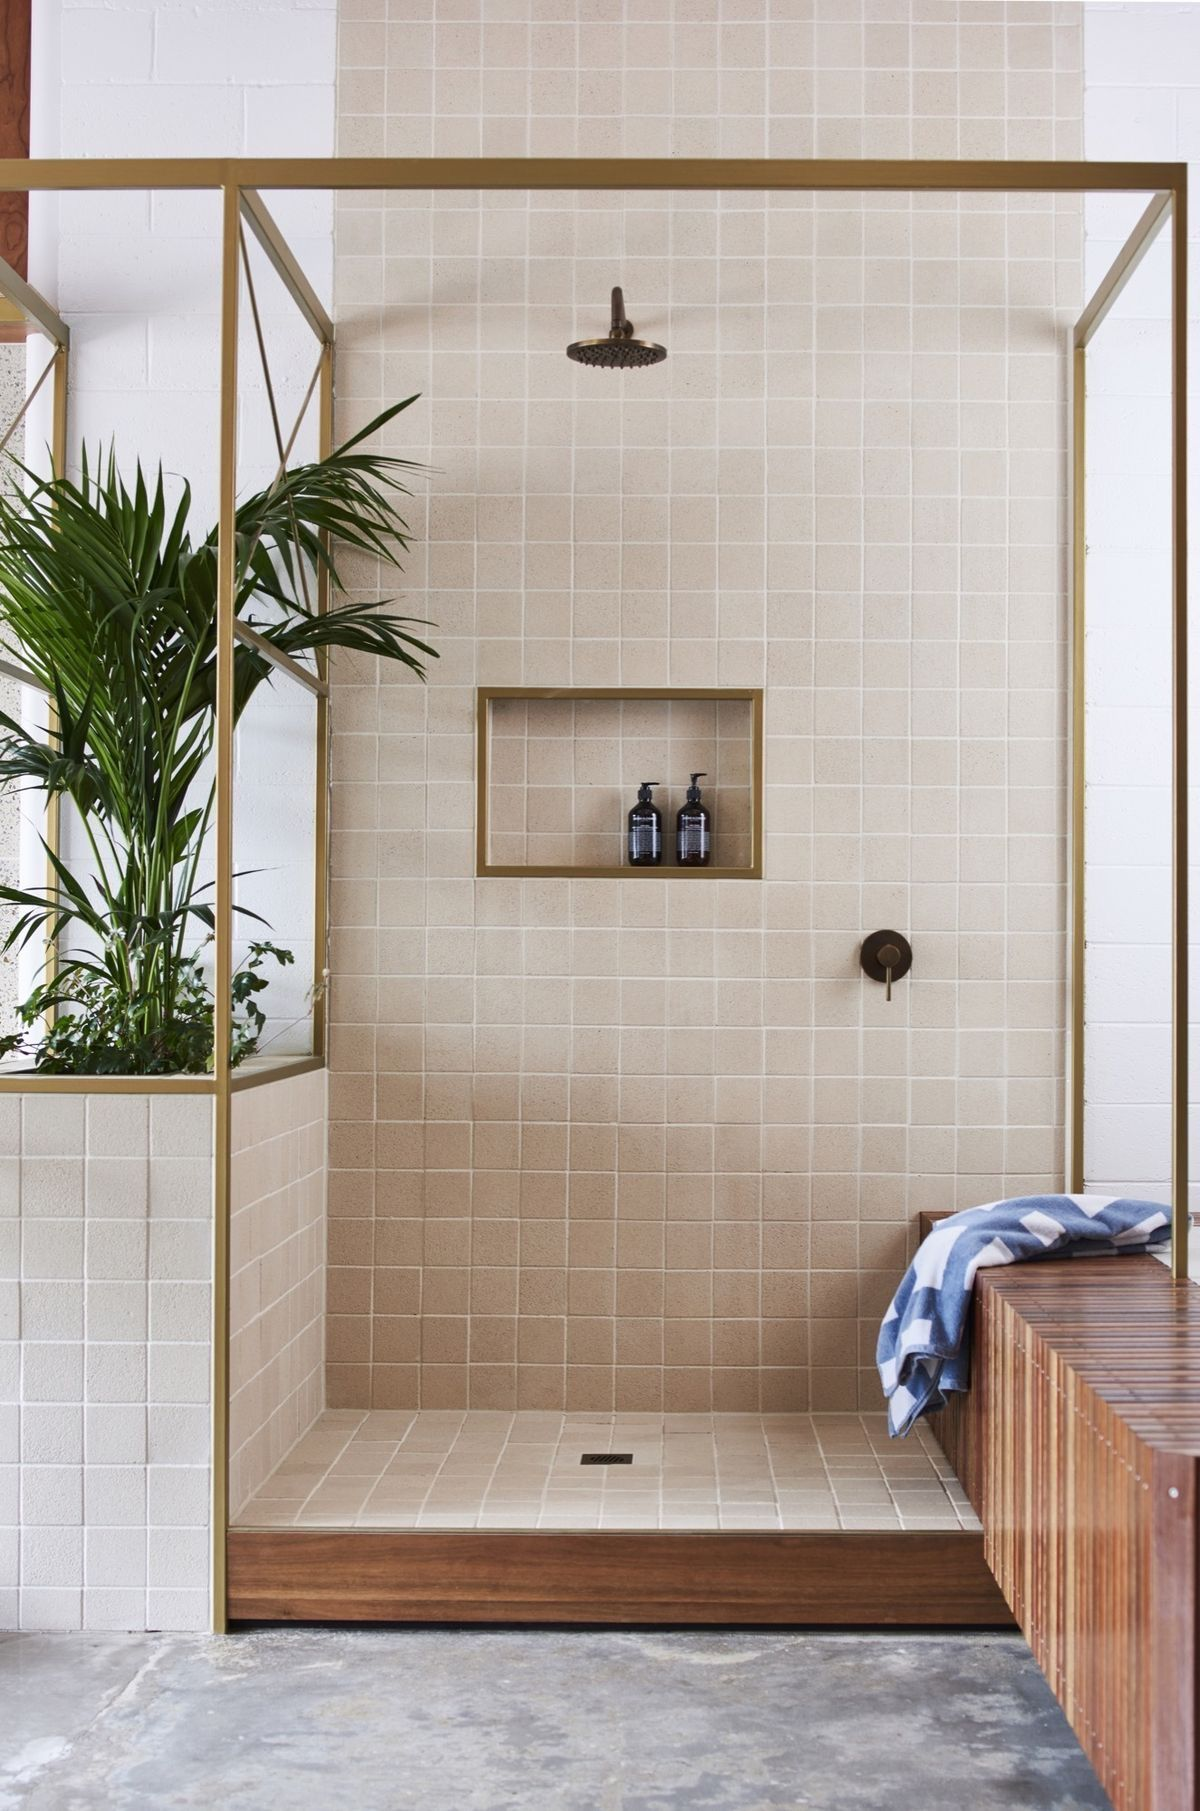 Artisan Salle De Bain Oise ~ half wall with planter to break up shower tub home pinterest